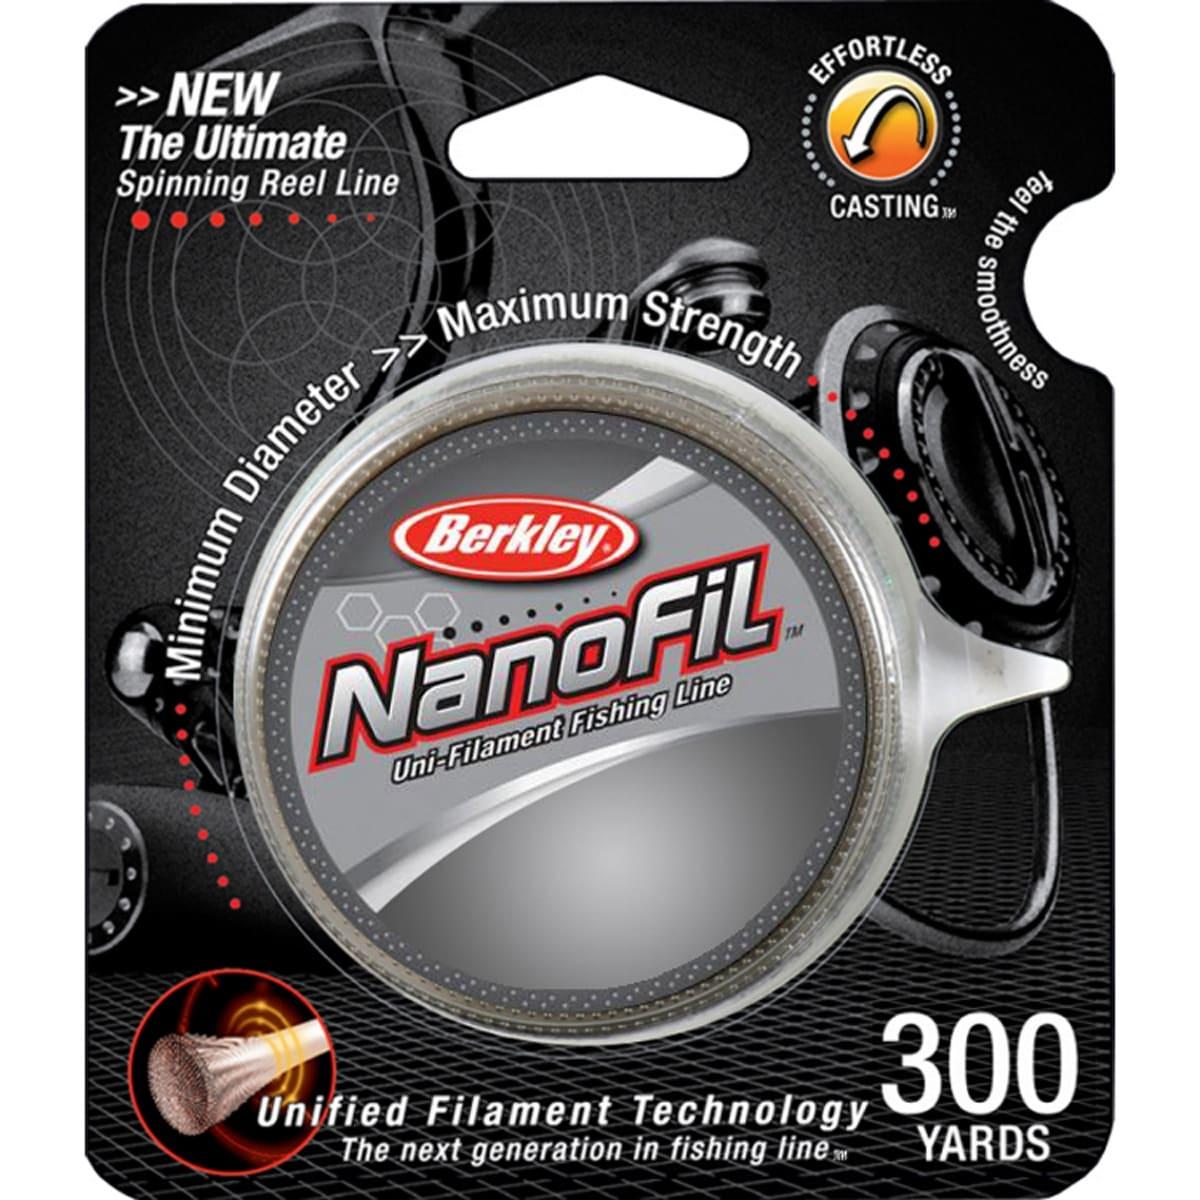 Berkley NanoFil Uni-Filament Fishing Line 300 Yard